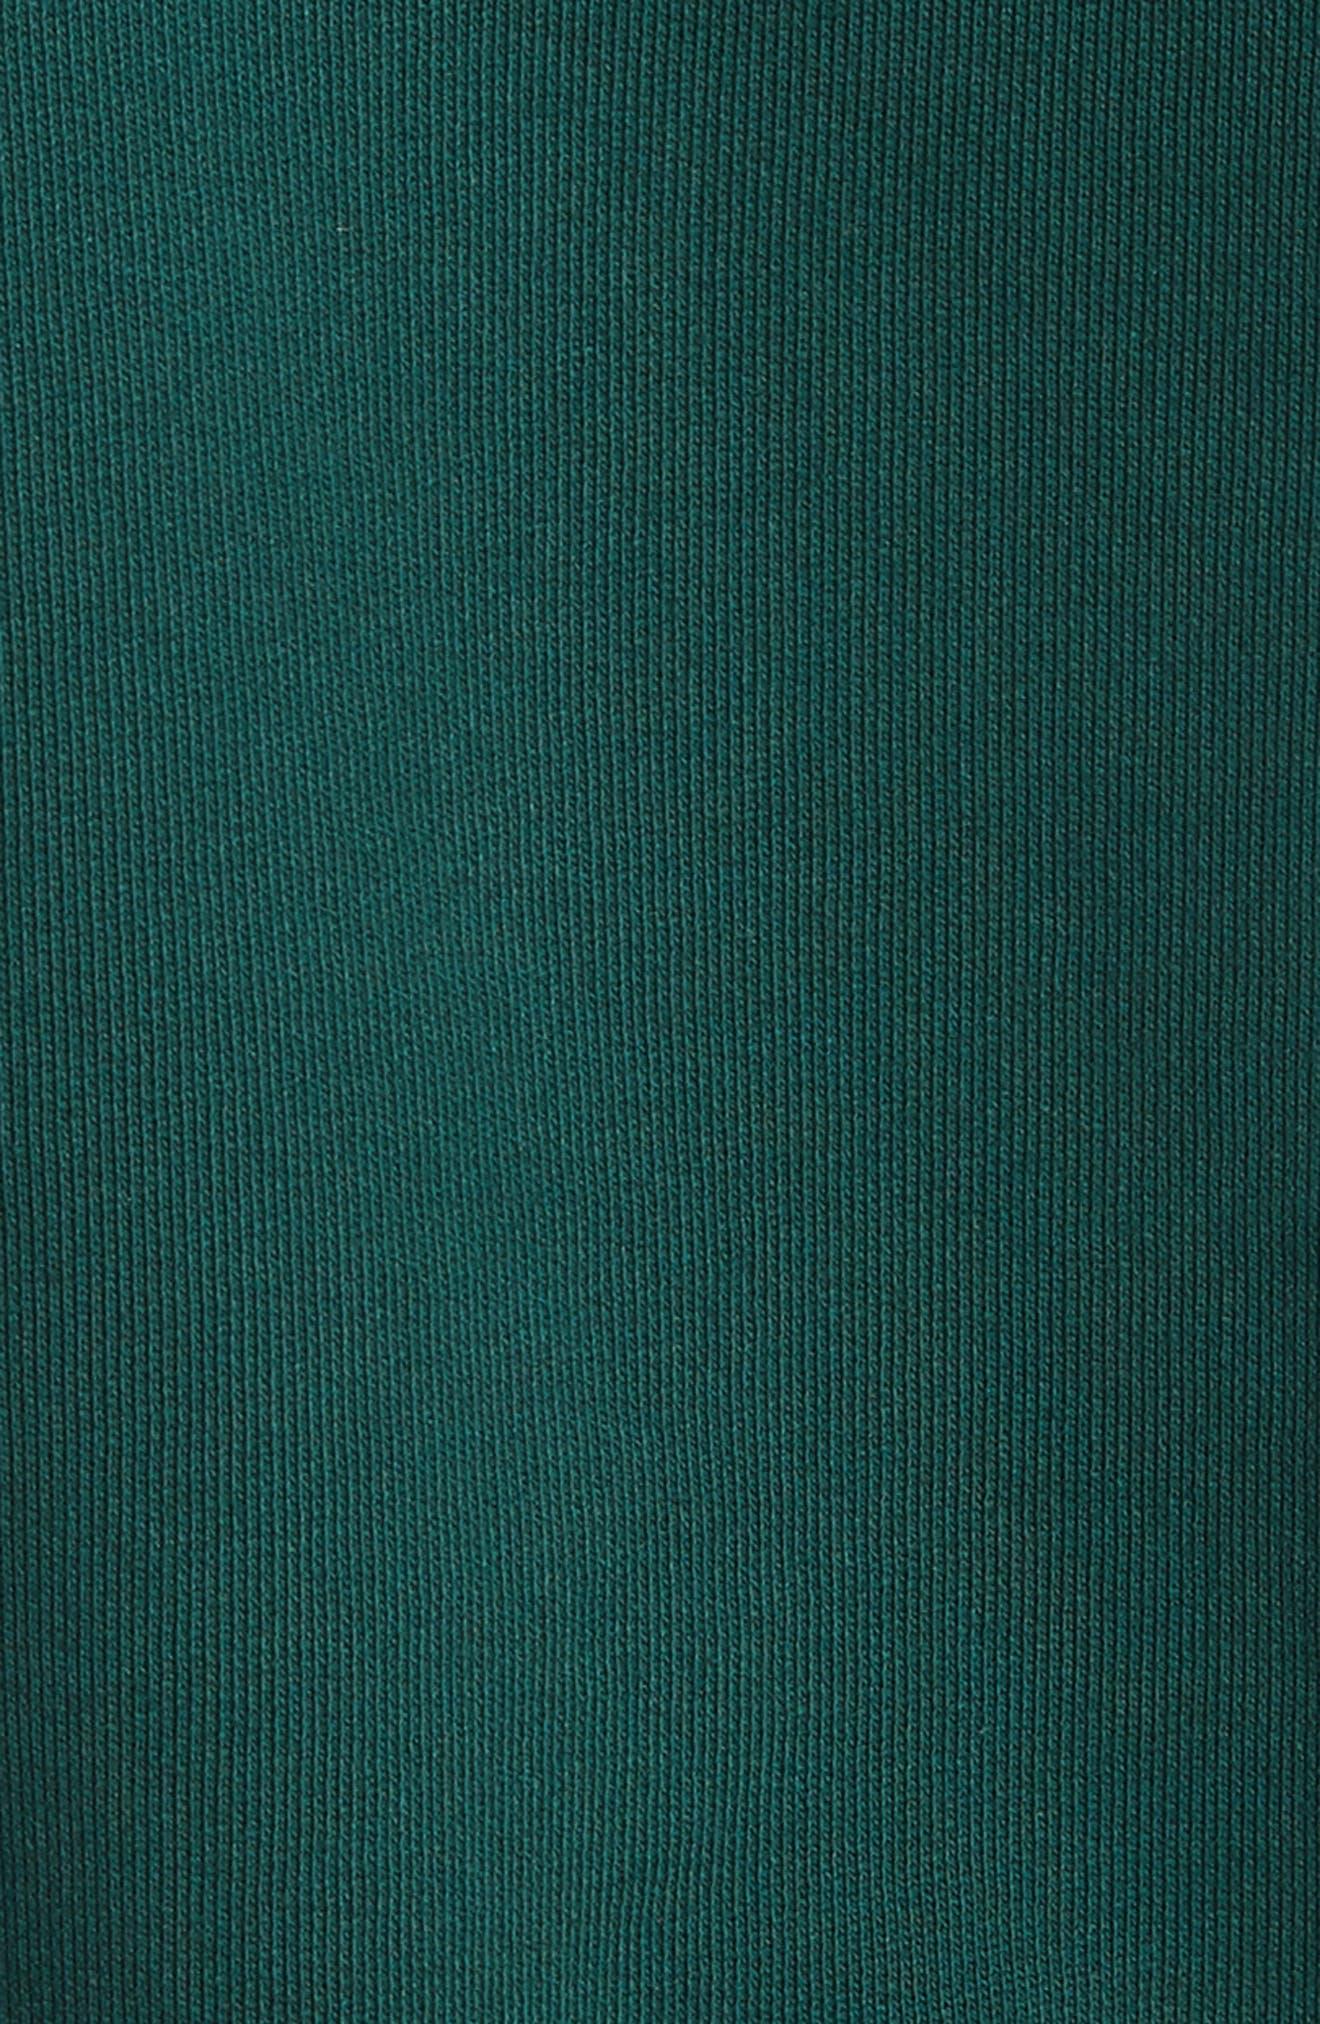 Airlines Crop Crewneck Sweatshirt,                             Alternate thumbnail 5, color,                             Dark Green